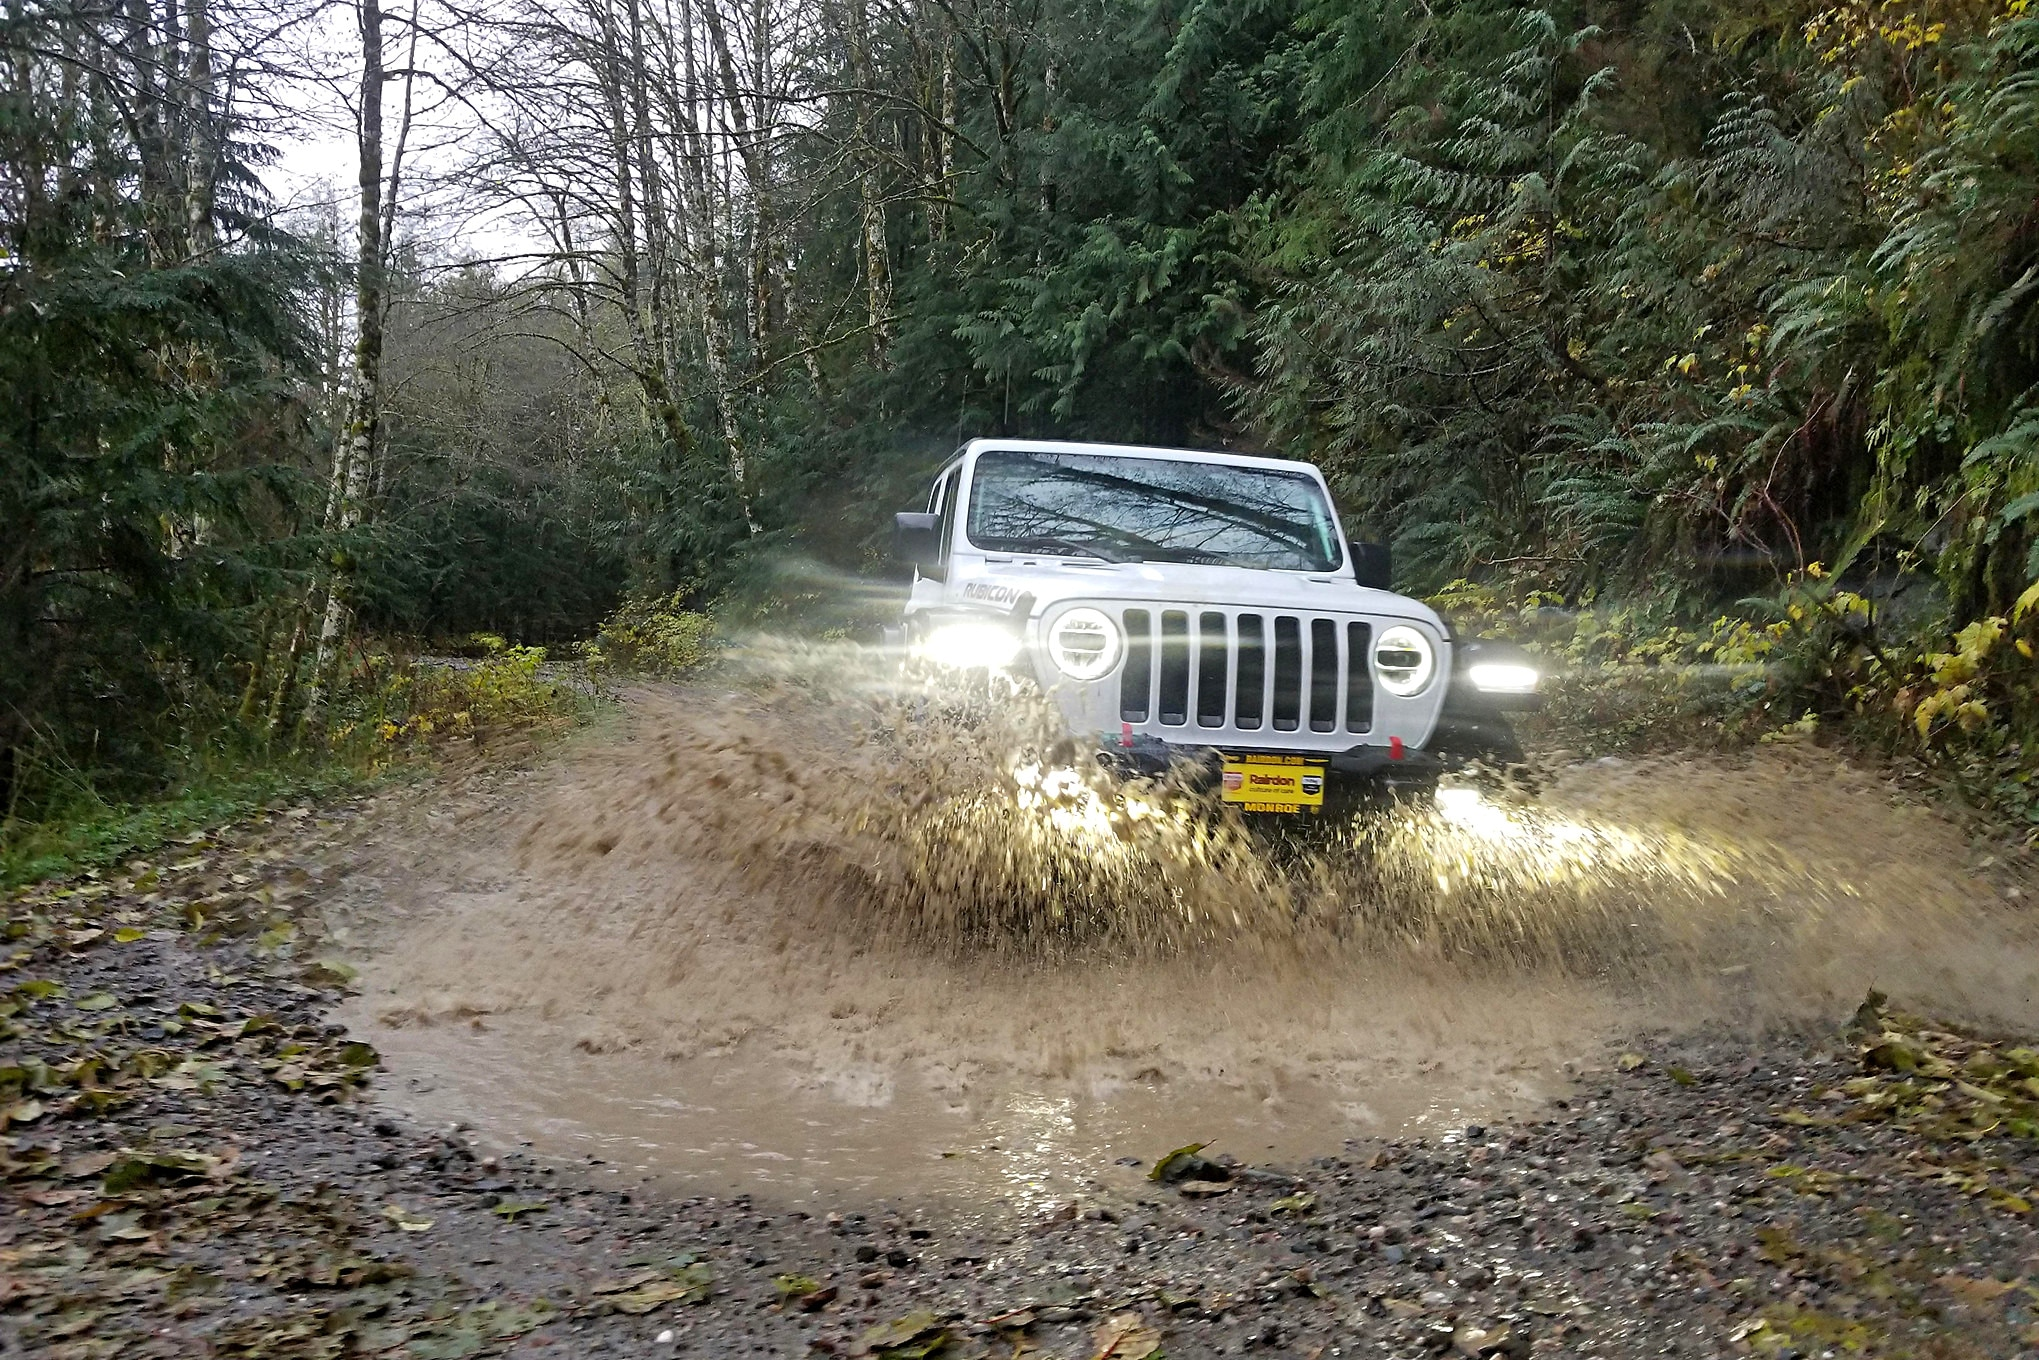 062 jeep shots friedner jlu